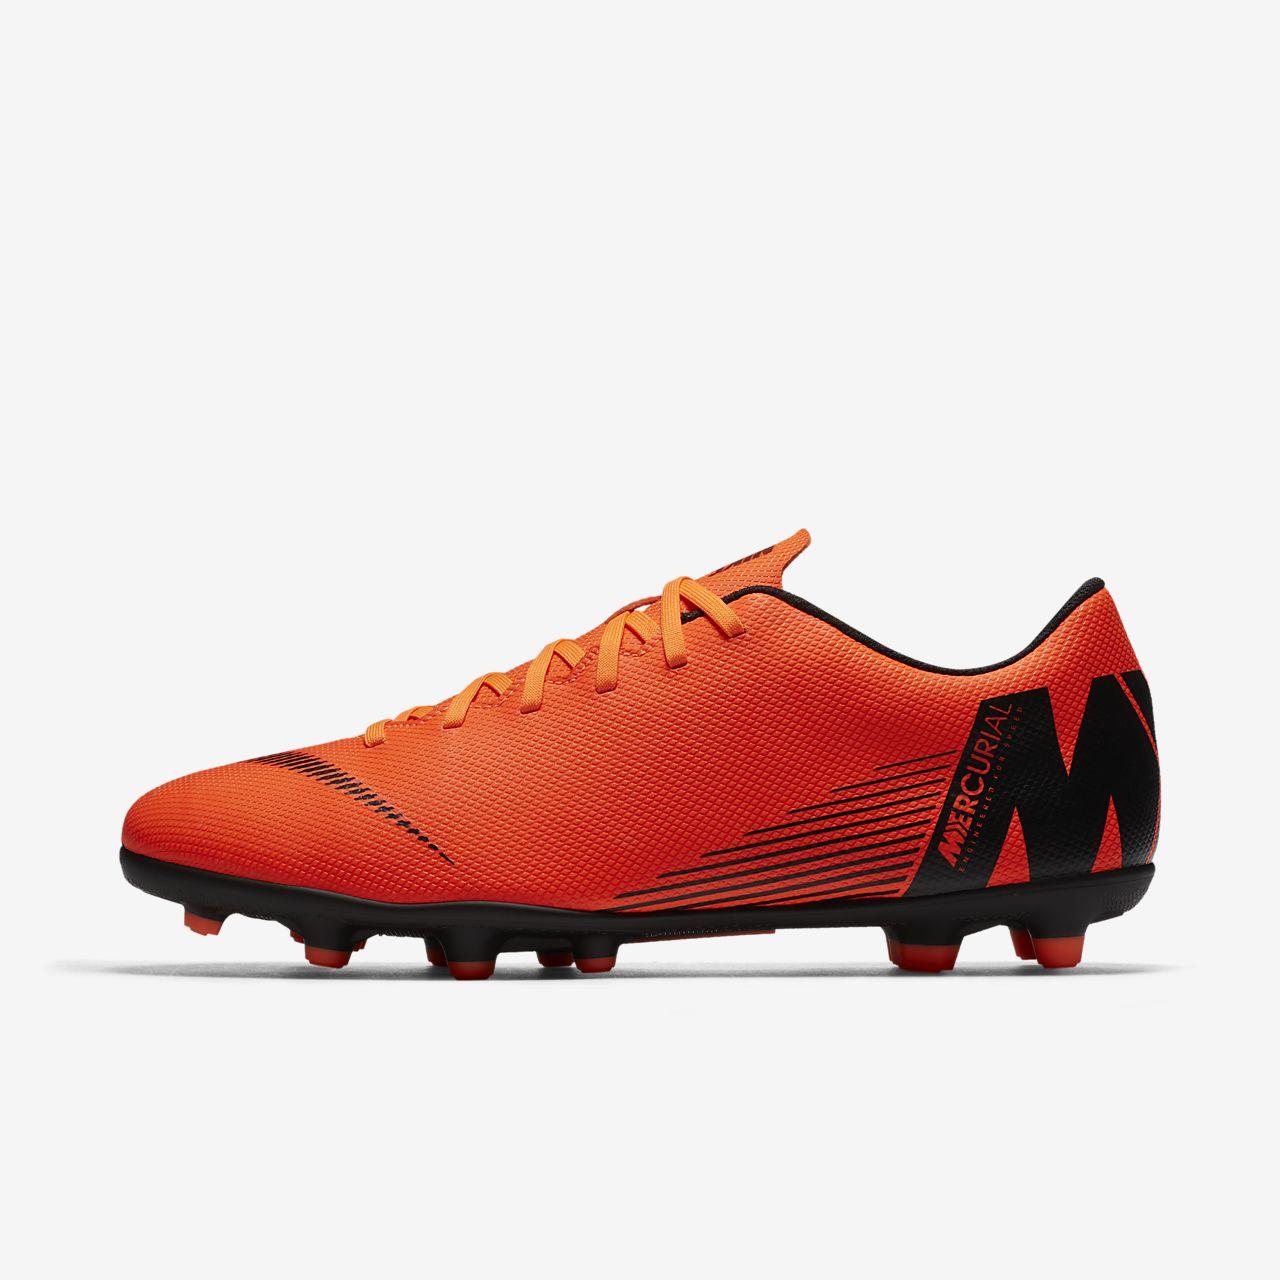 ... Nike Mercurial Vapor XII Club MG Multi-Ground Football Boot